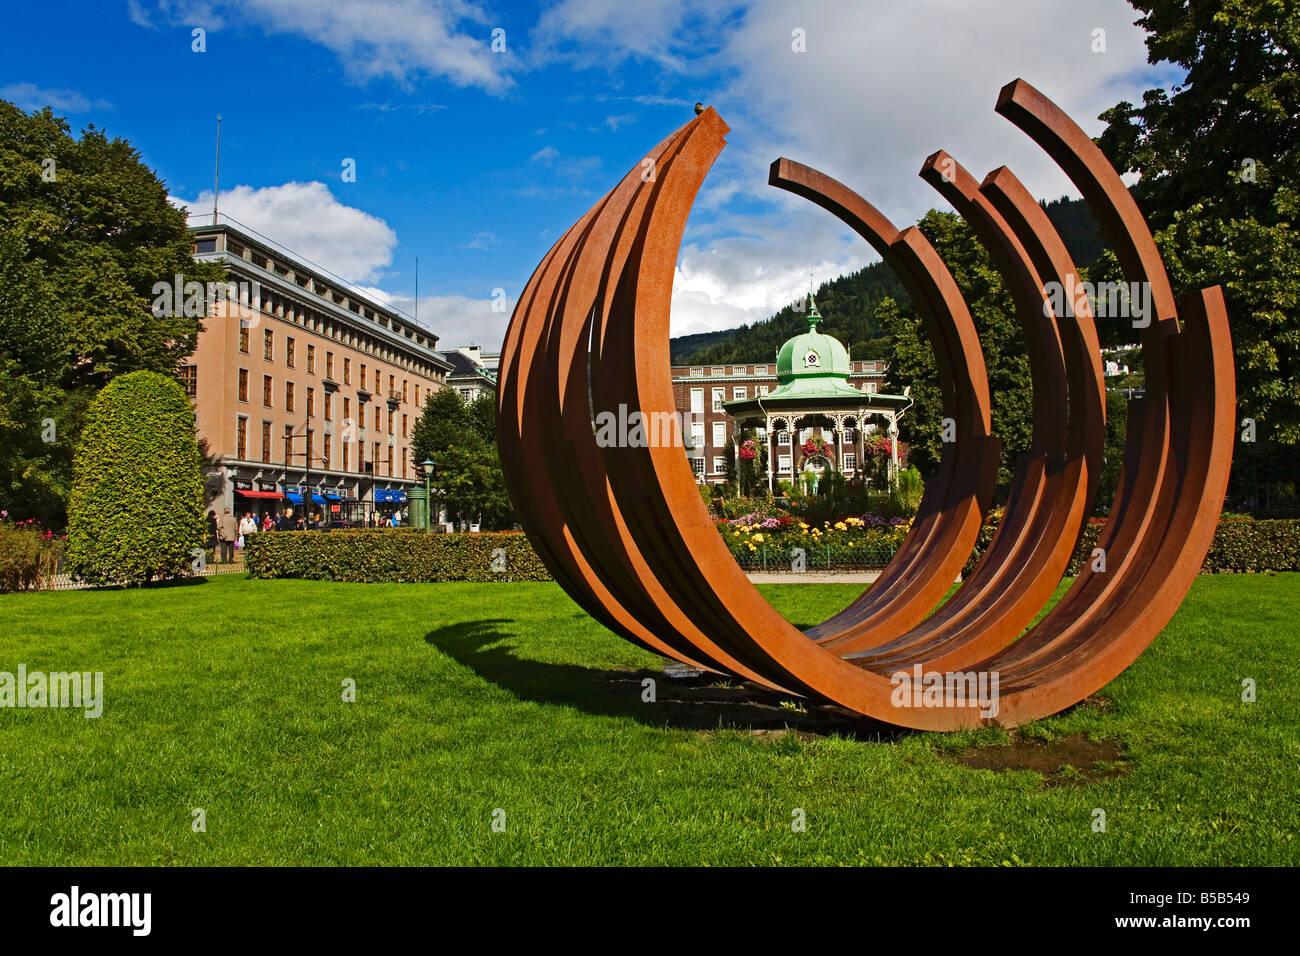 Sculpture outside the West Norway Museum of Decorative Art, Bergen, Norway, Scandinavia, Europe Stock Photo